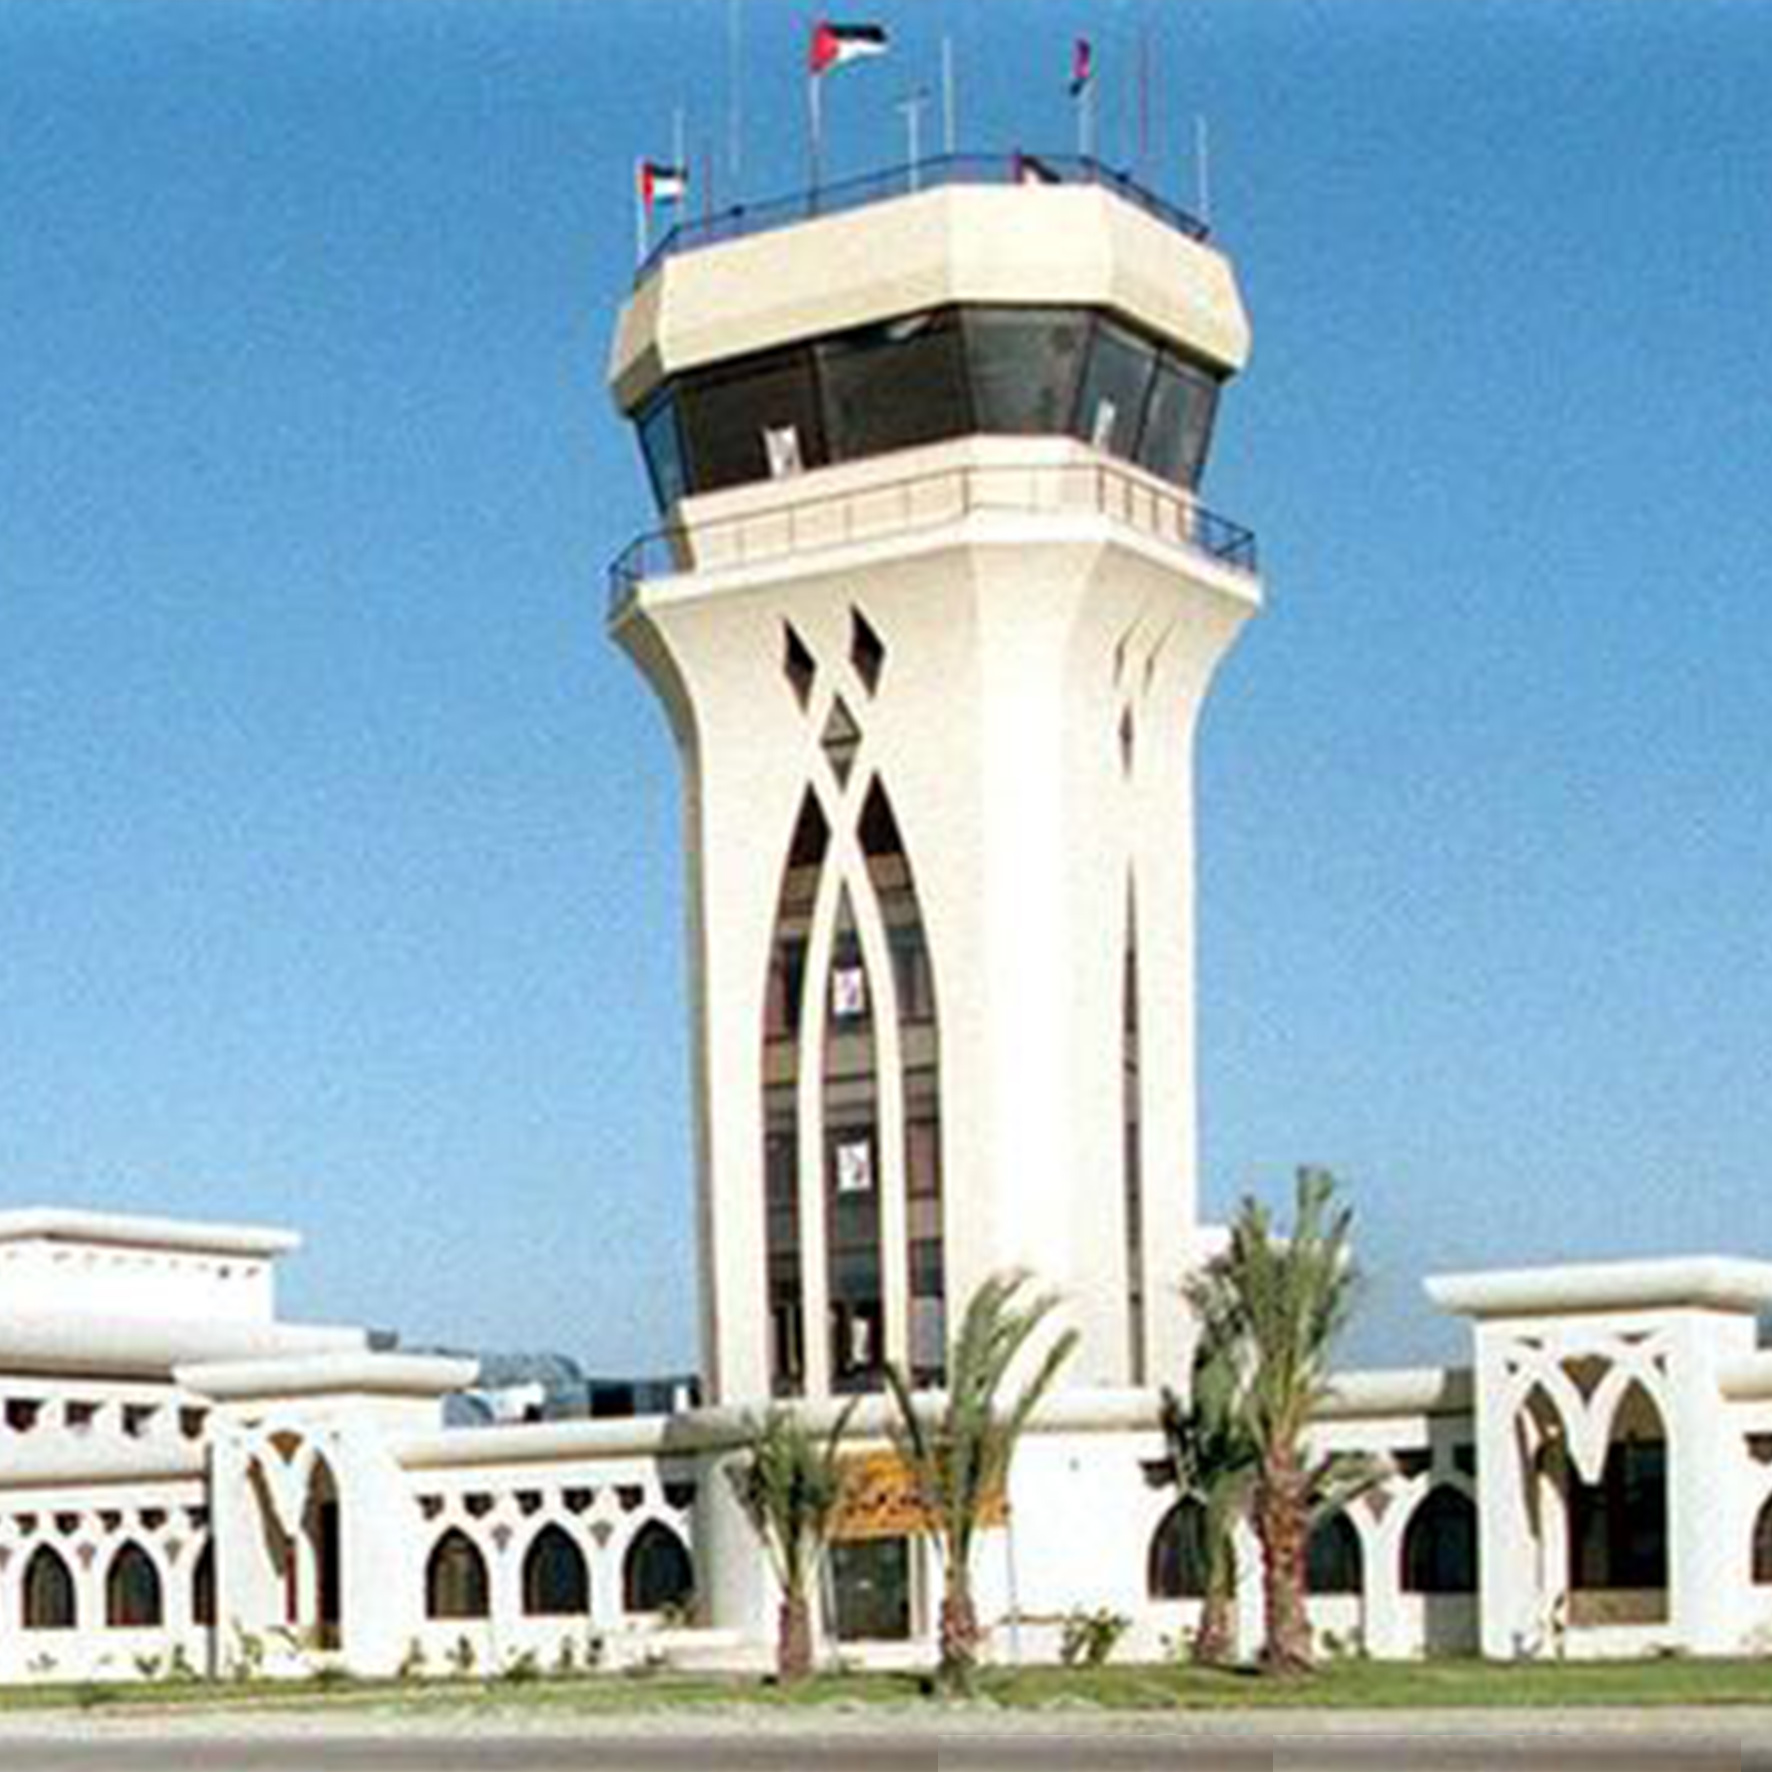 images/599470531-annes-arafat-gaza-international-airport-jihad-abu-daka-rafah.jpg